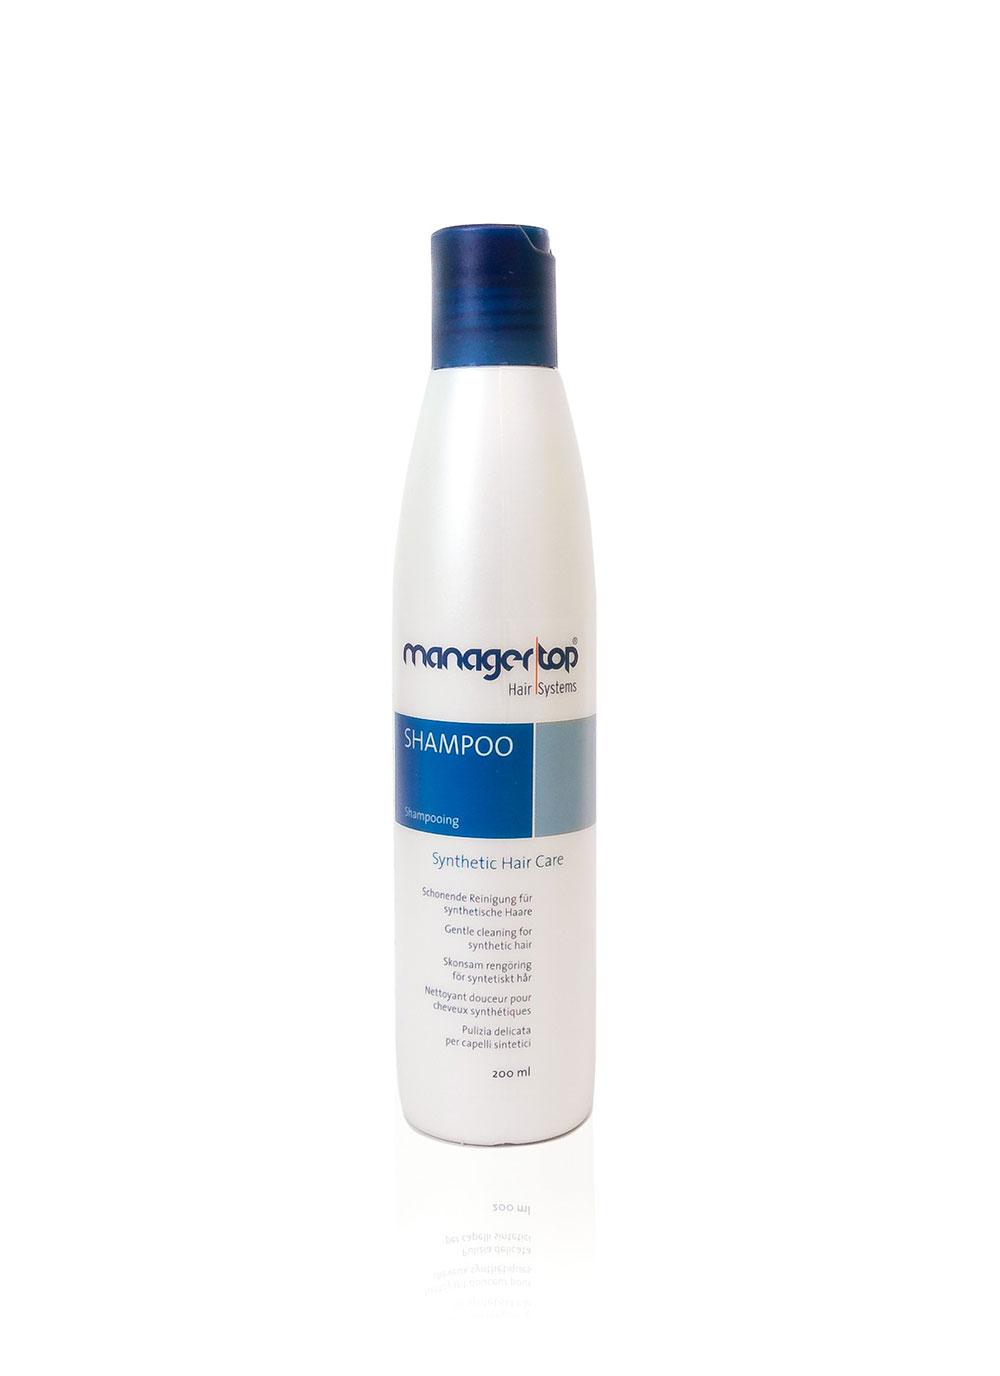 Dening Hair Zubehör - Manager Top Shampoo Kunsthaar 200ml